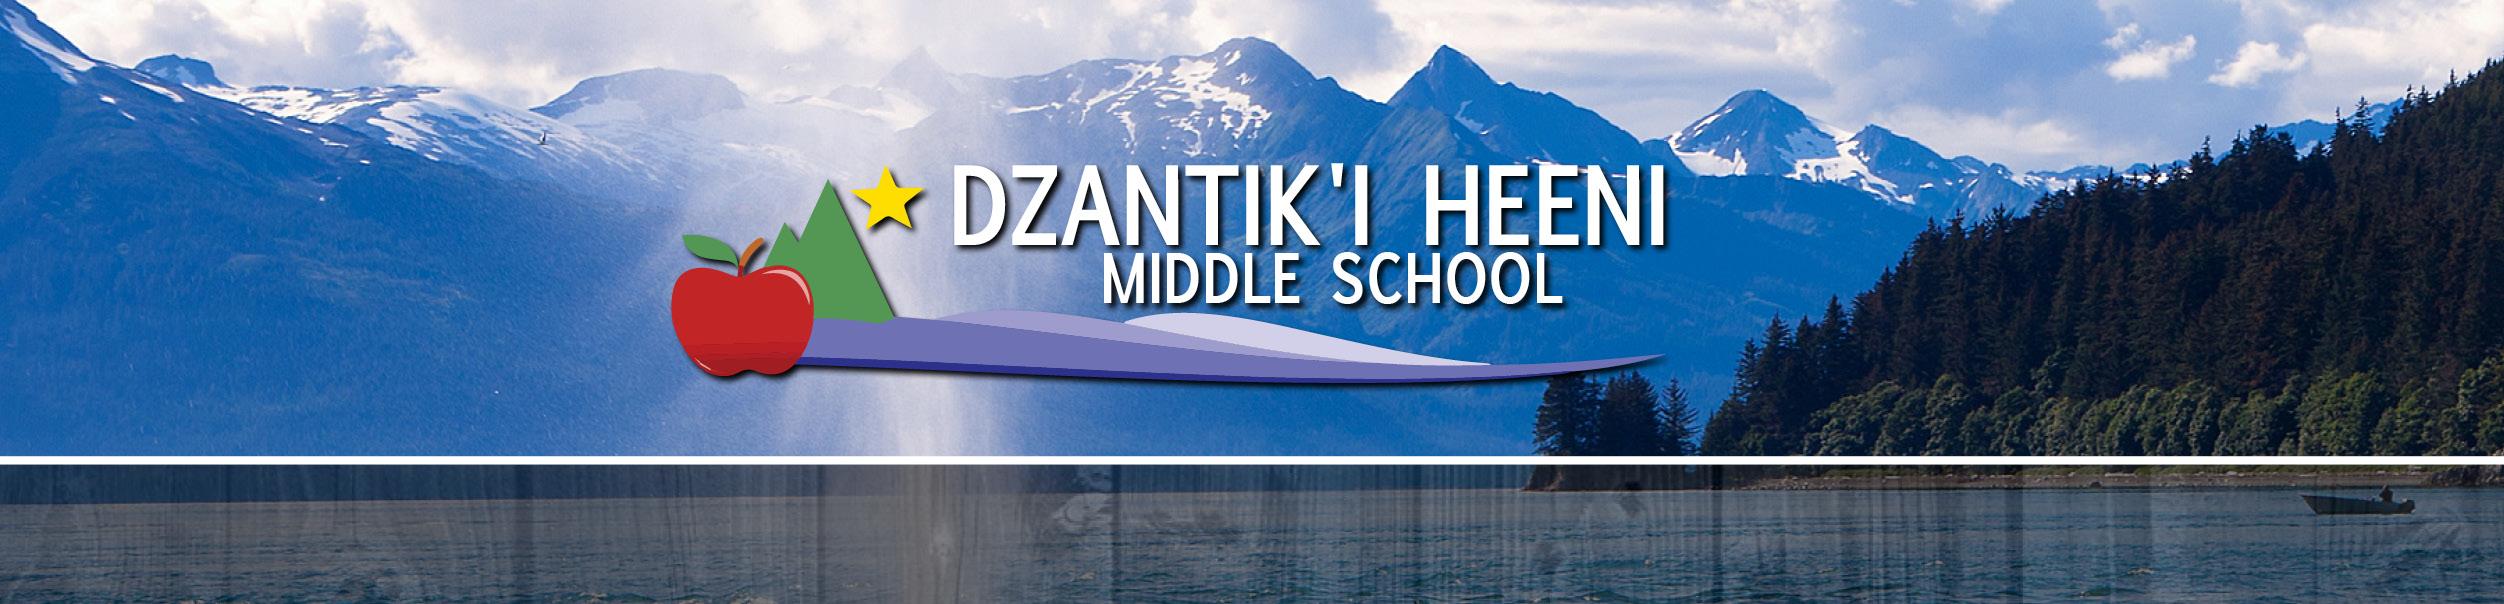 Welcome to Dzantik'i Heeni Middle School